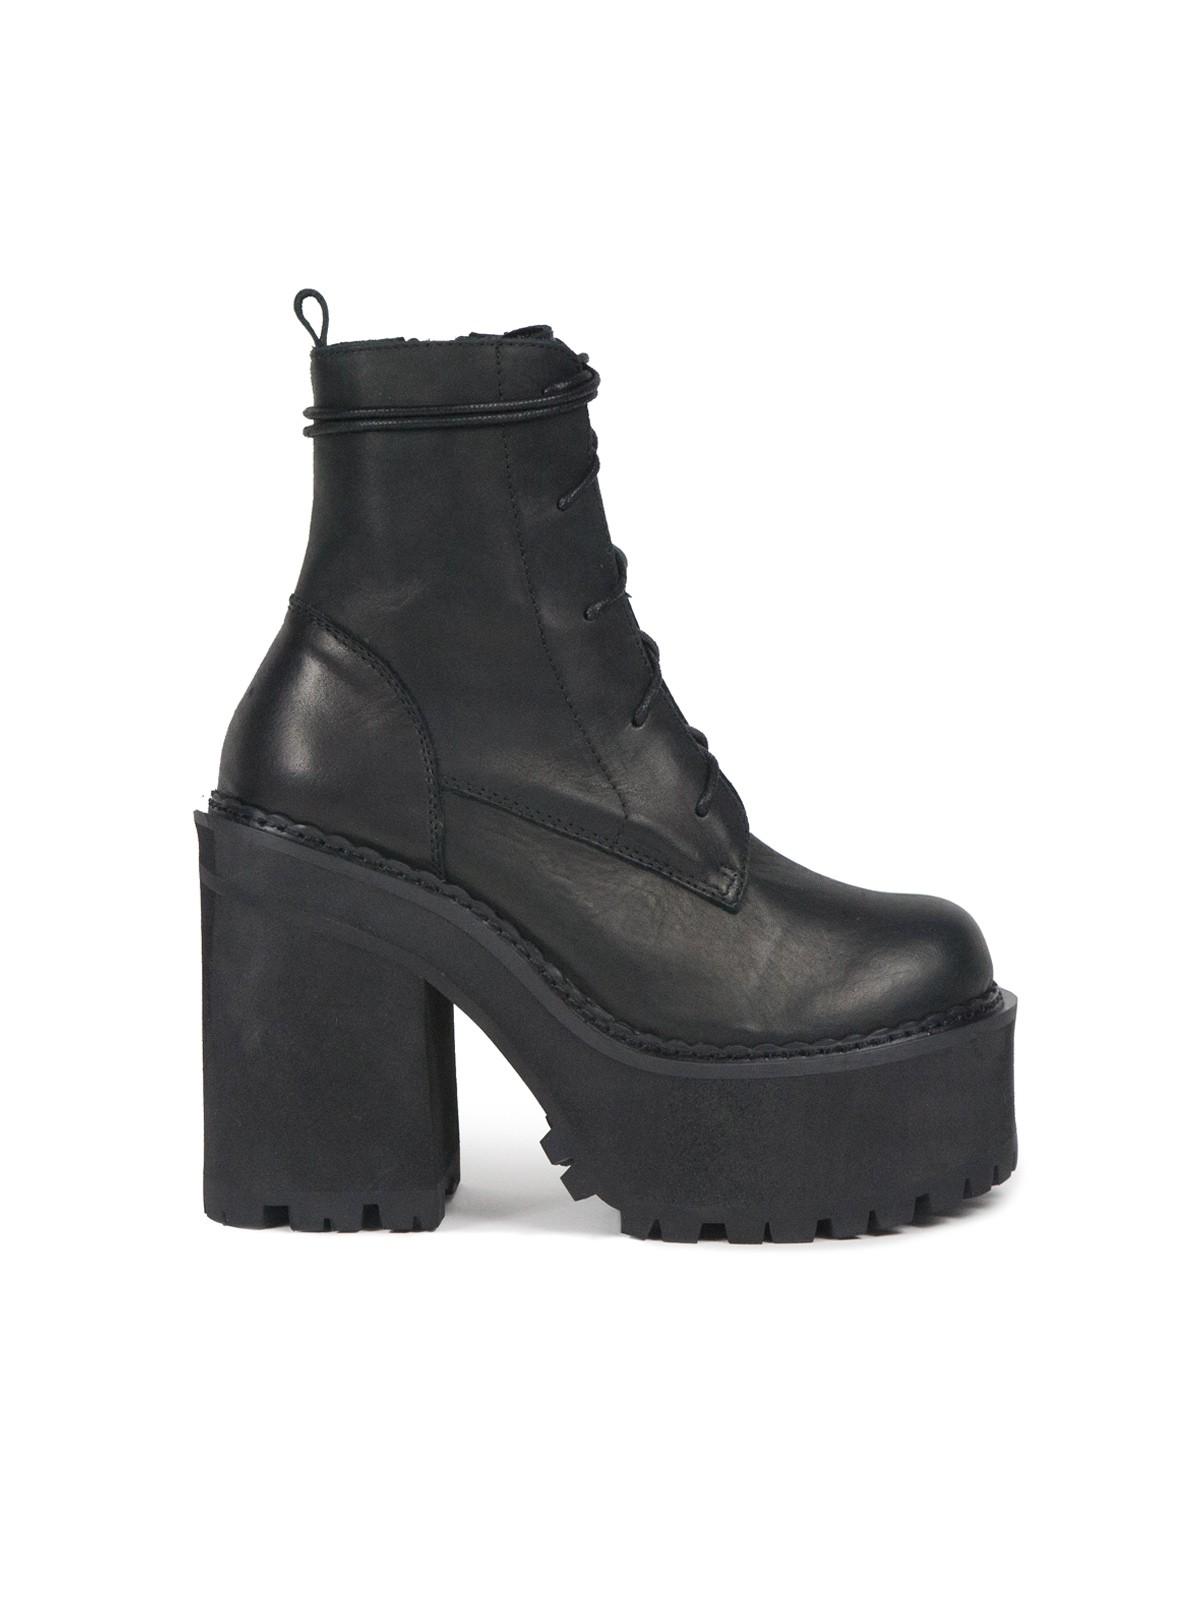 unif choke boot